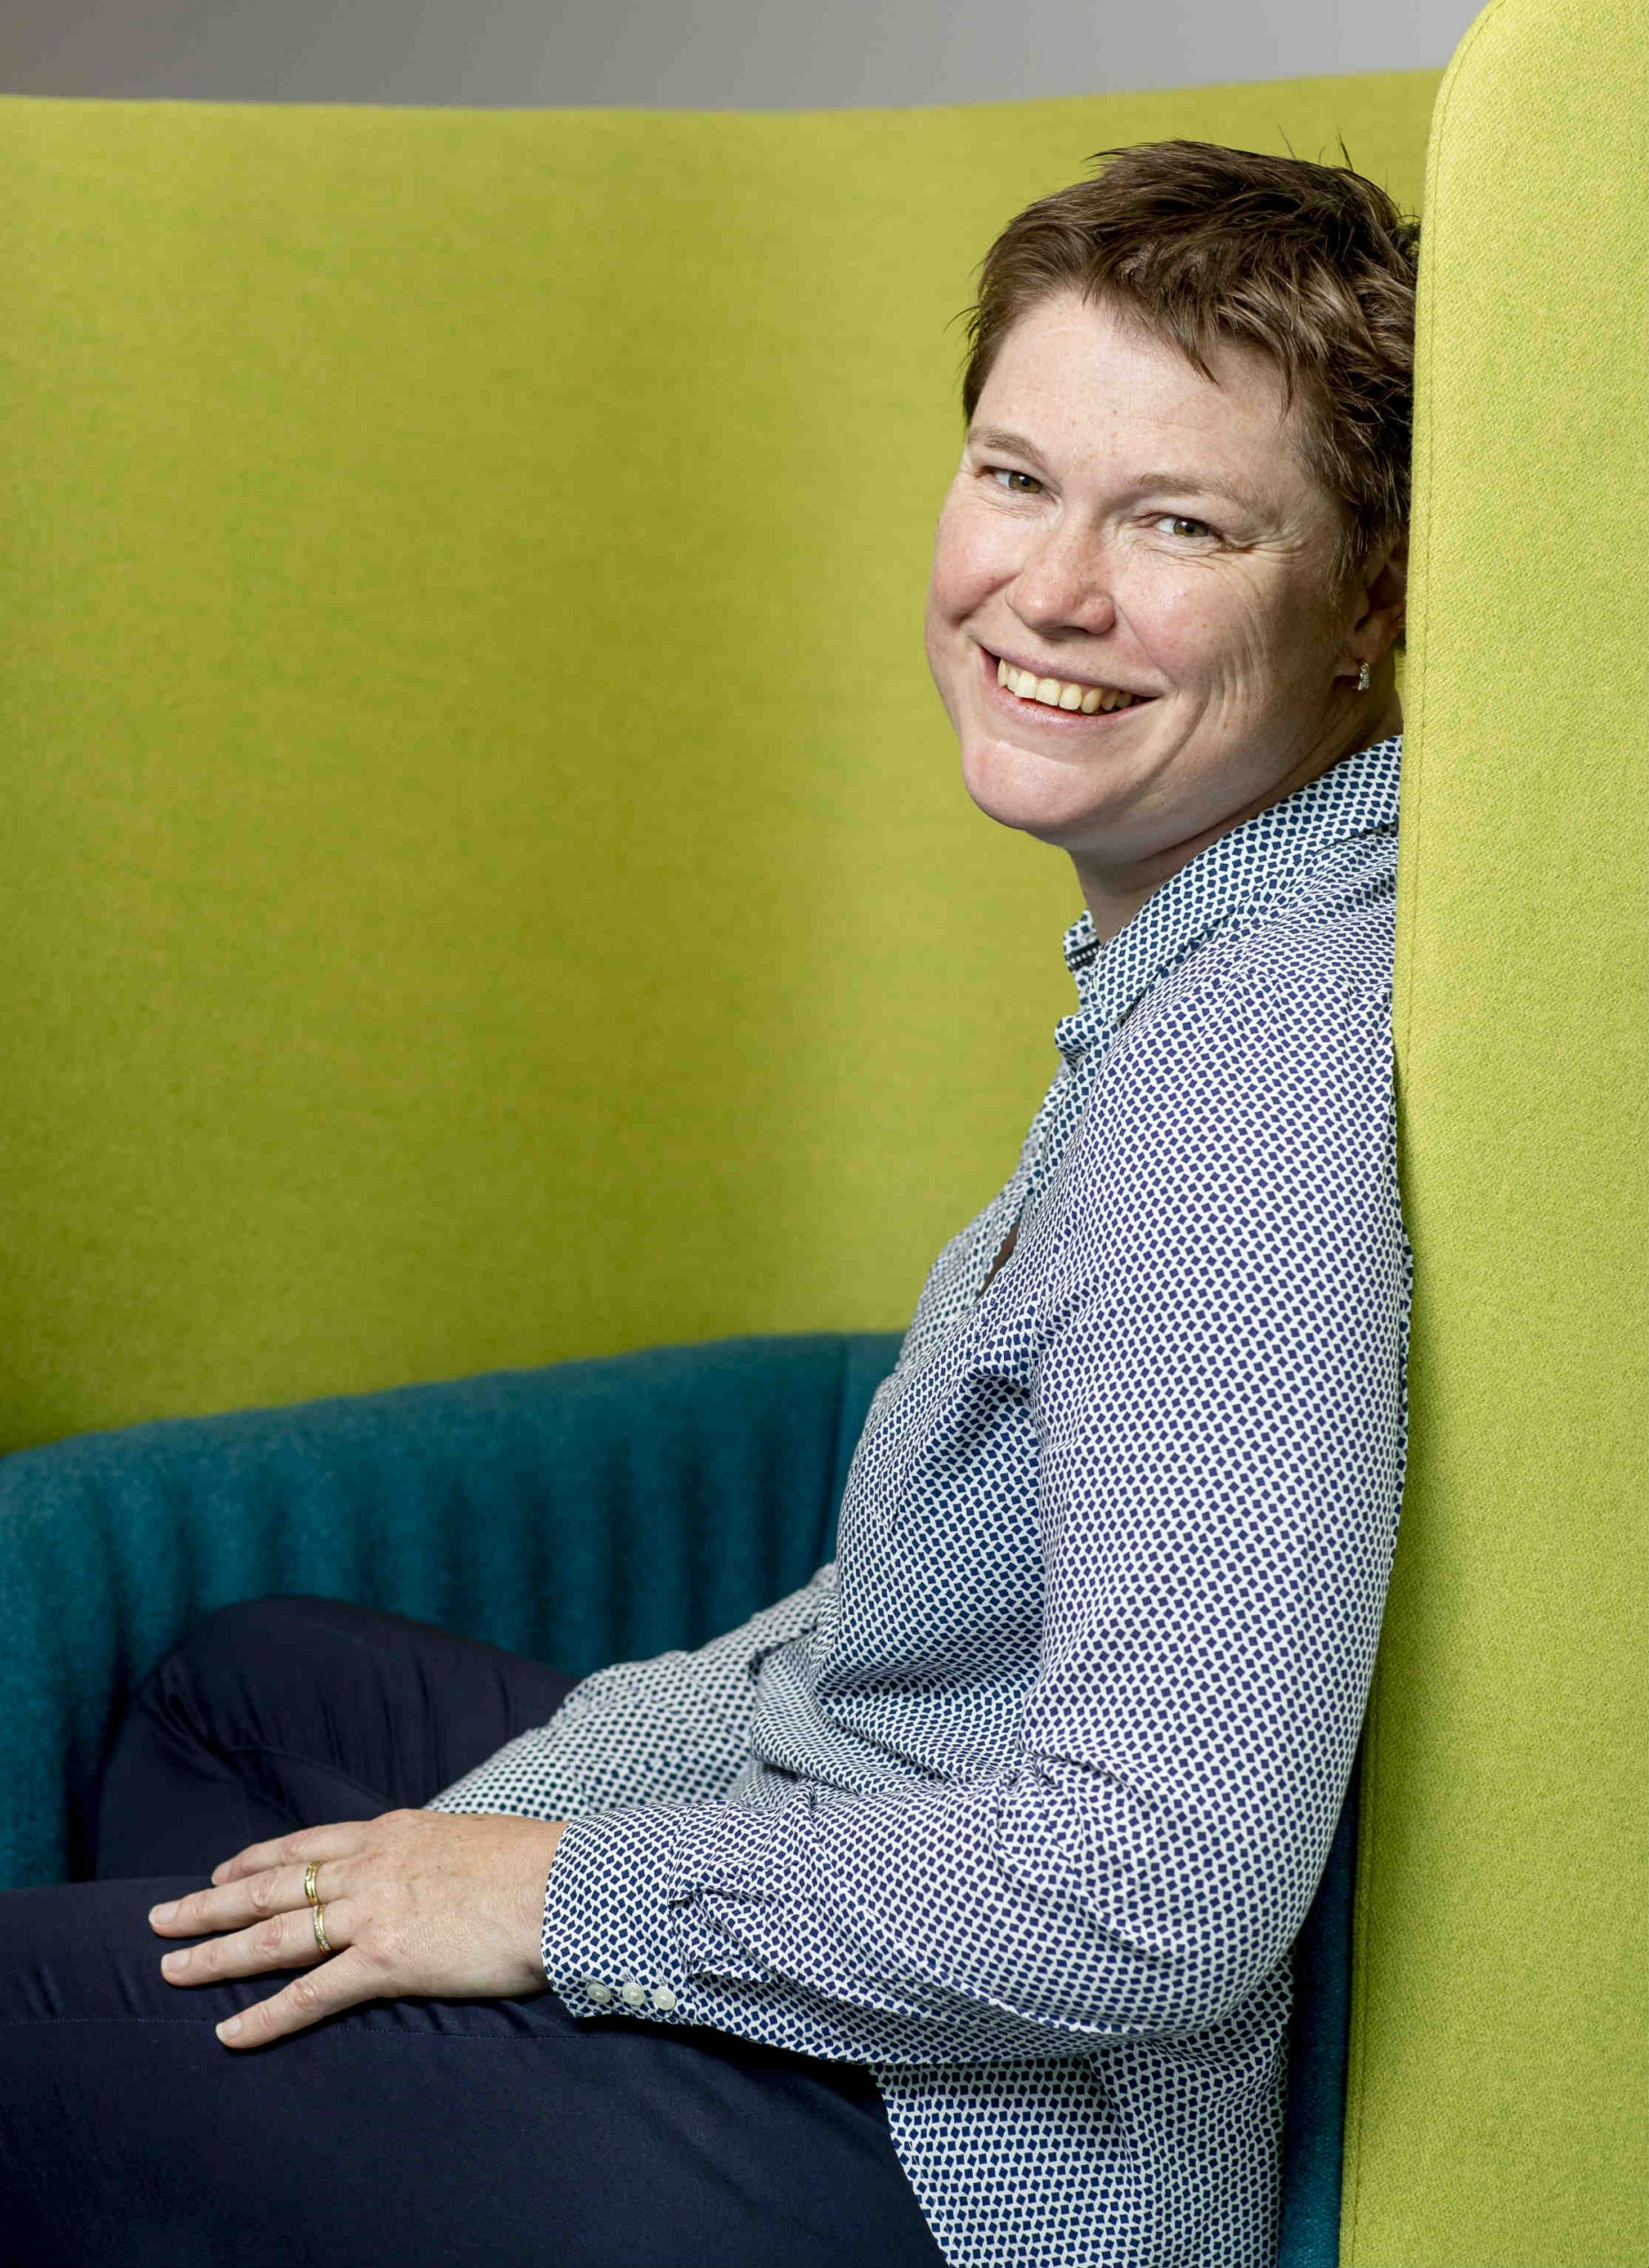 Jolanda Bruinenberg